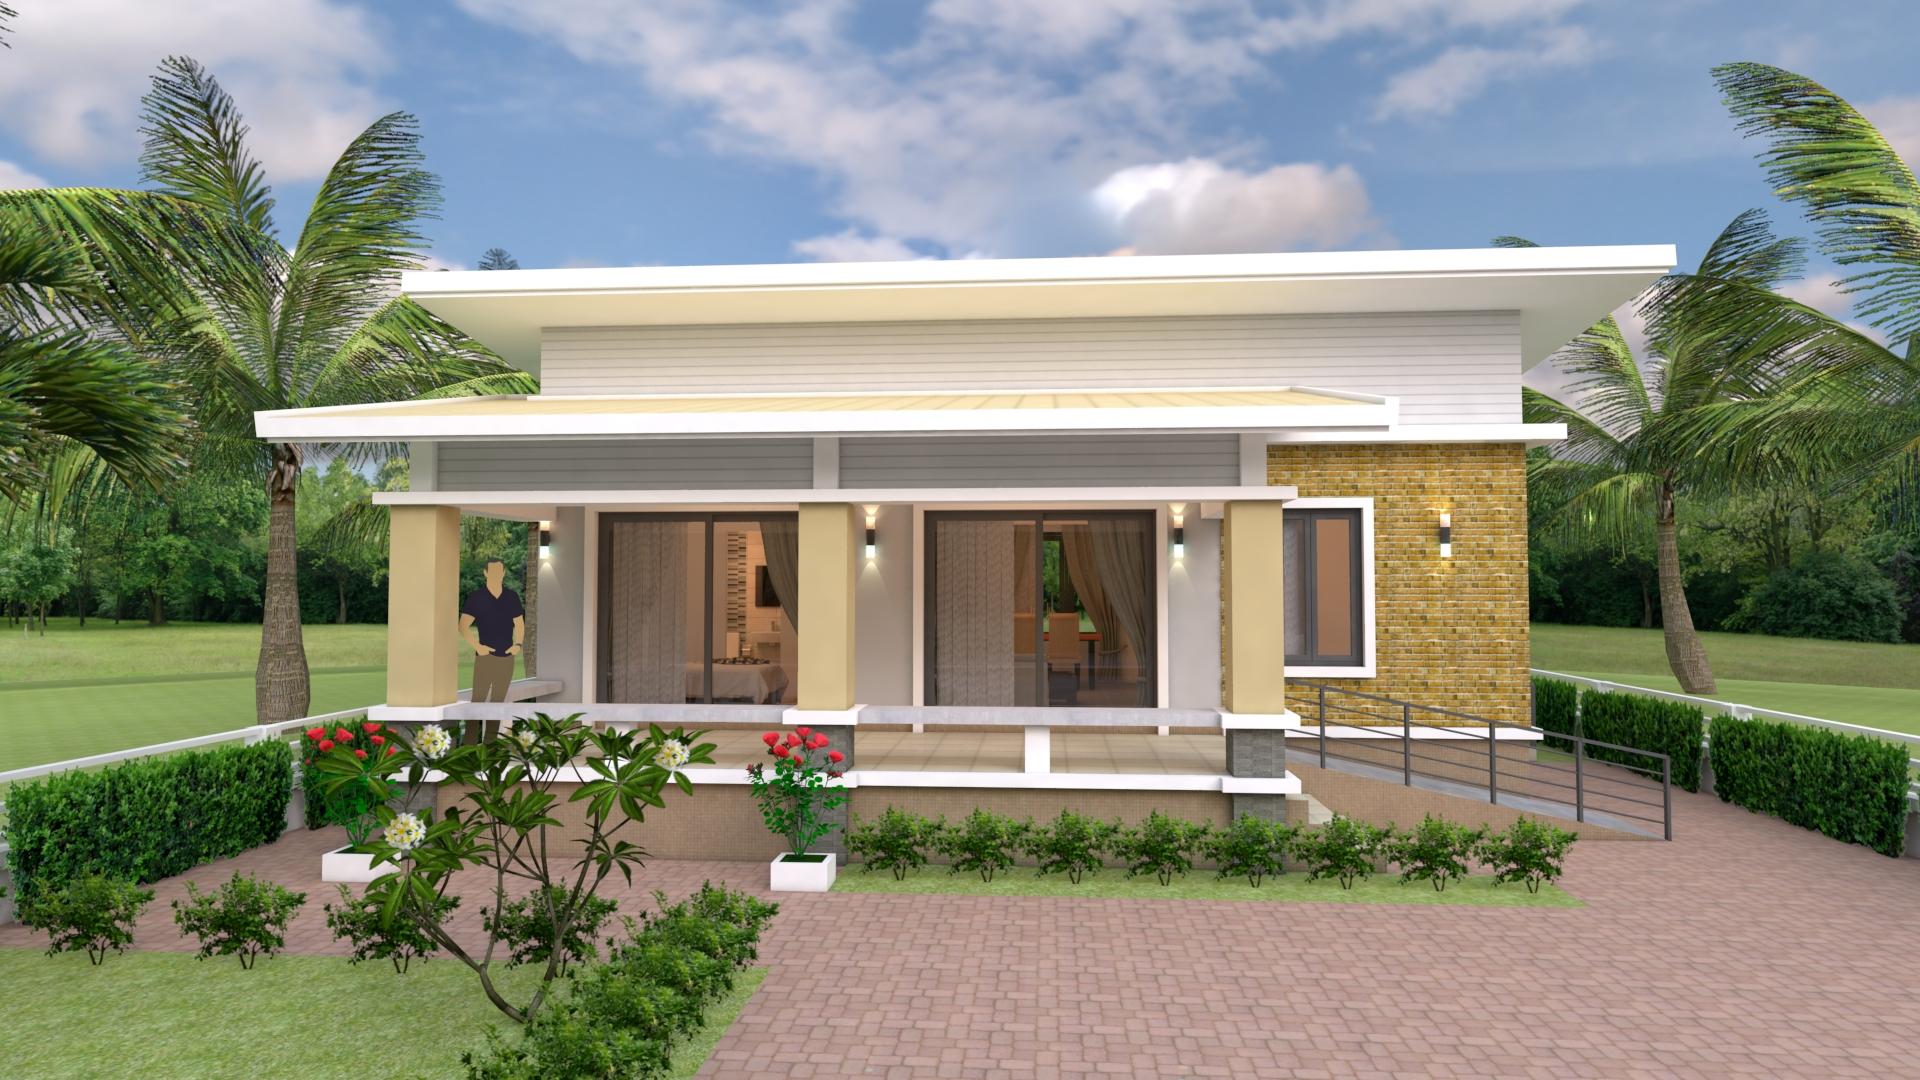 Home Design Plans 10x10 Meter 33x33 Feet 2